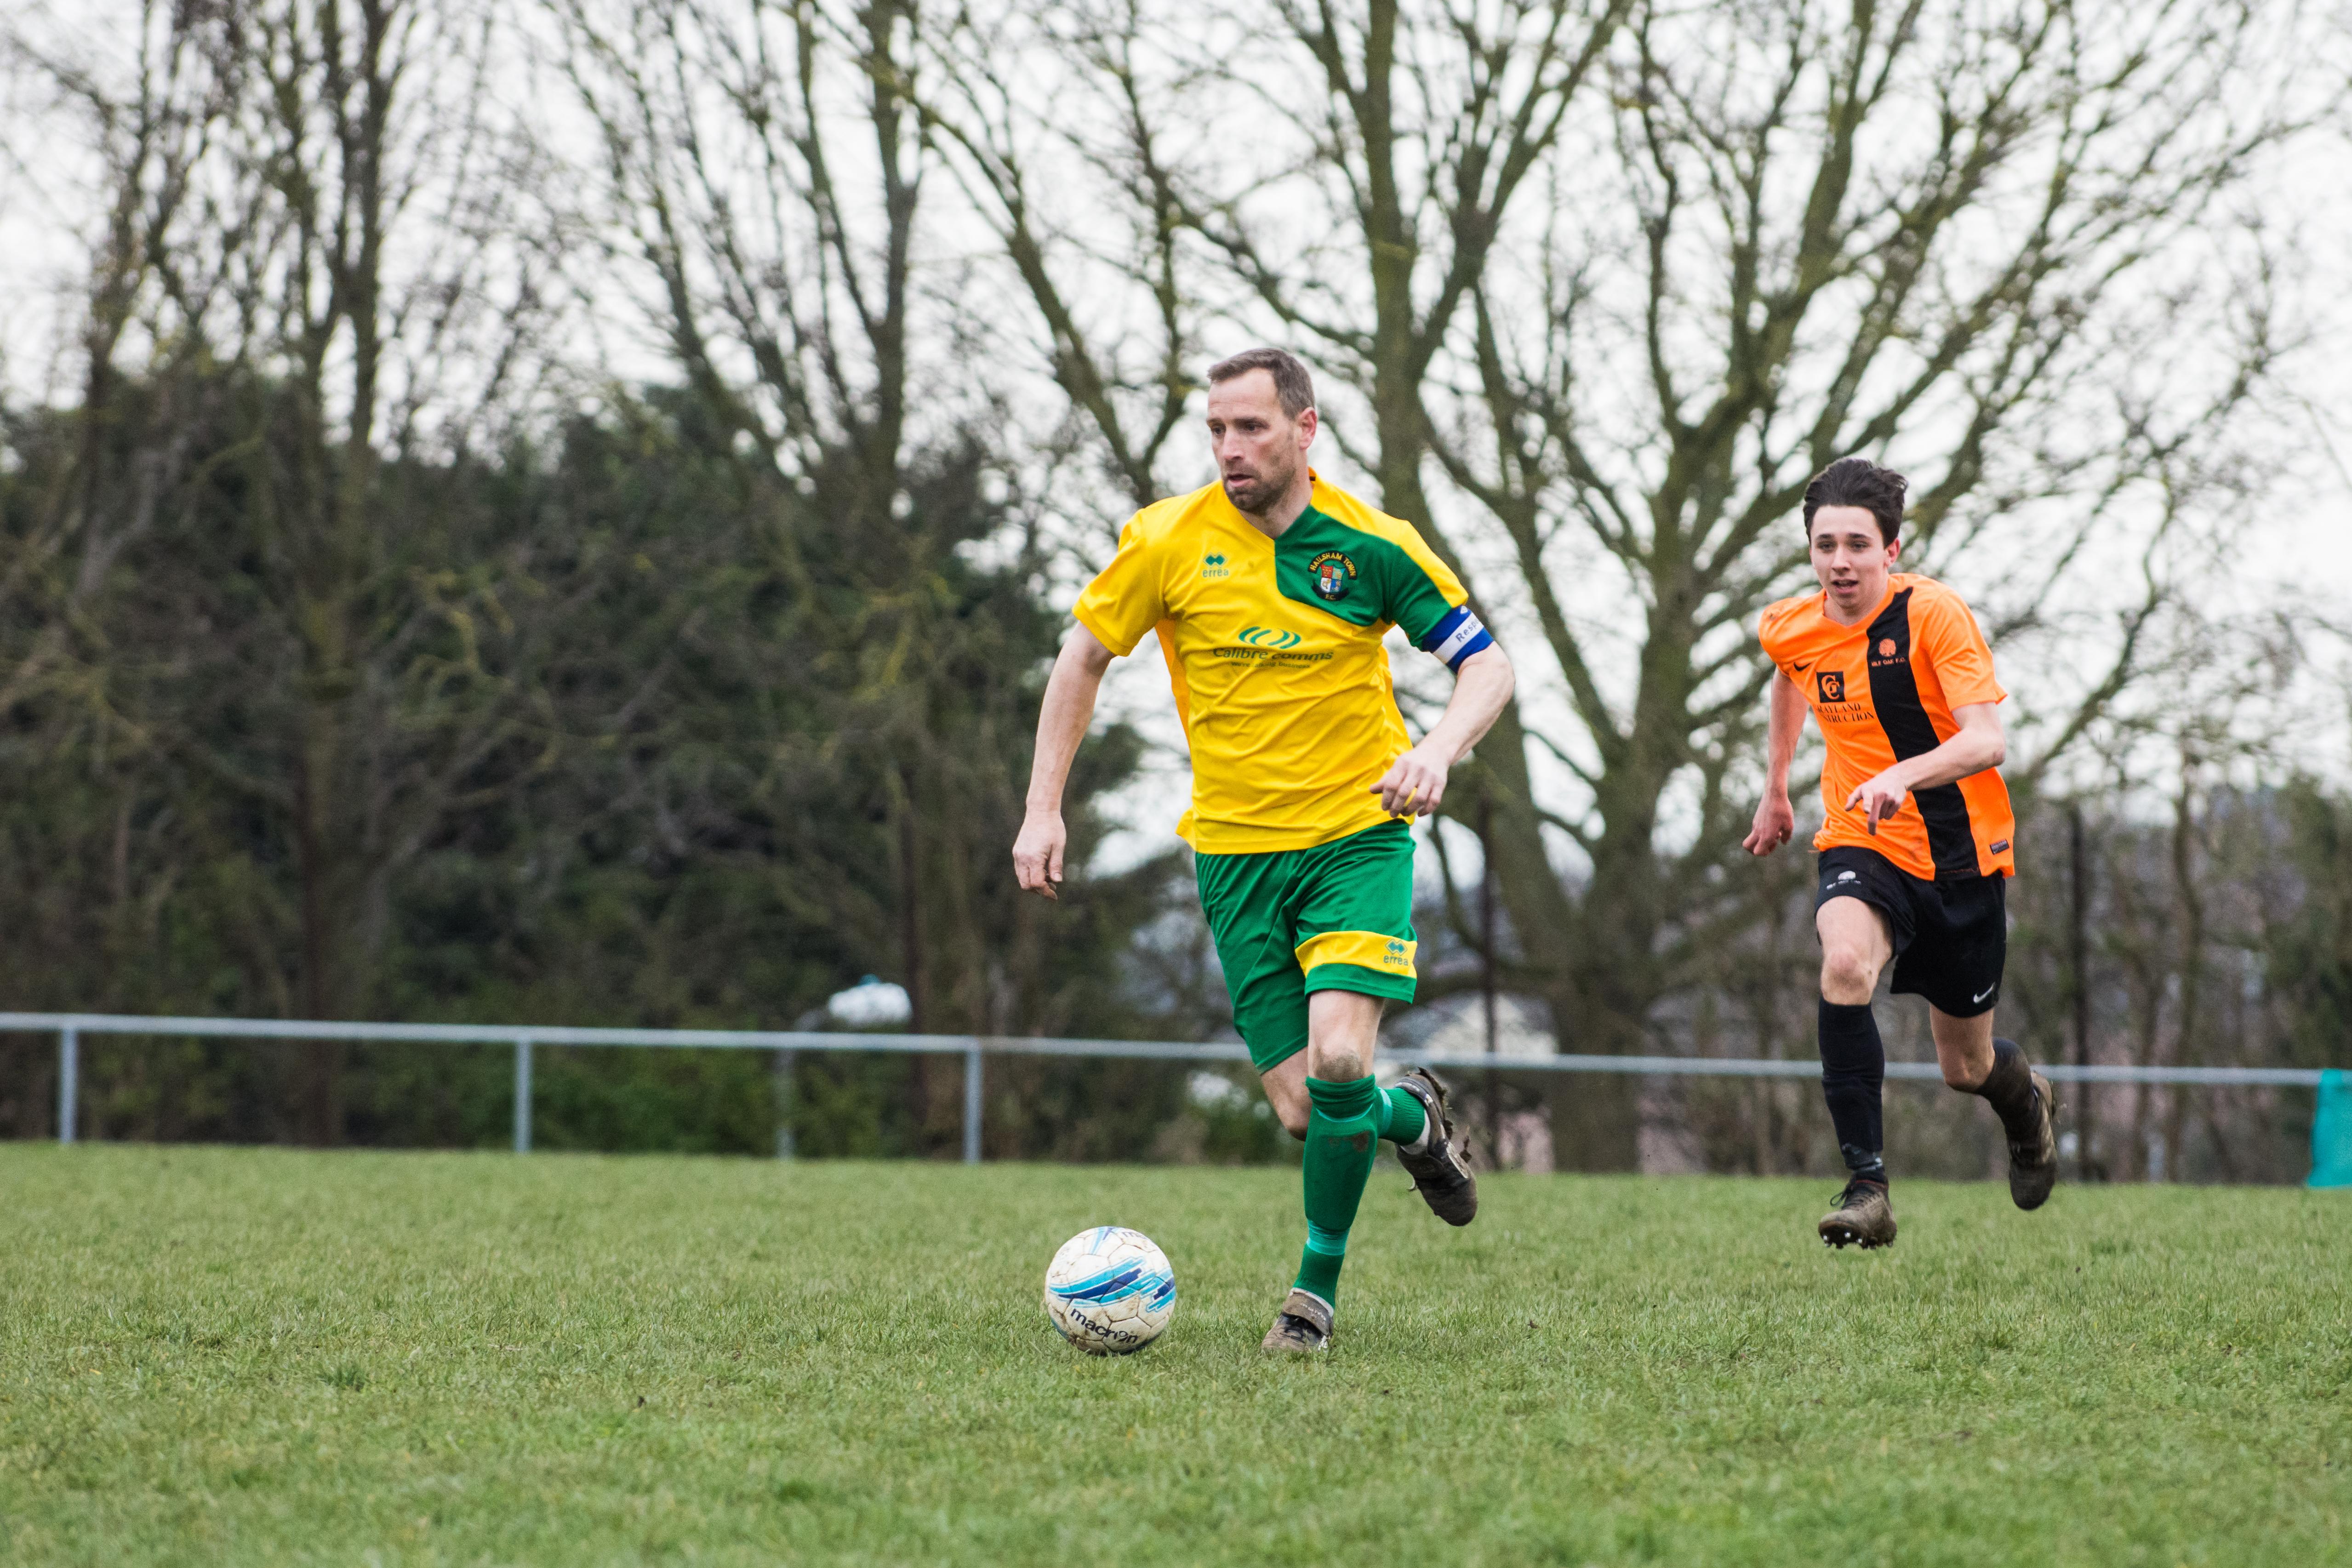 DAVID_JEFFERY Mile Oak FC vs Hailsham Town FC 24.03.18 52